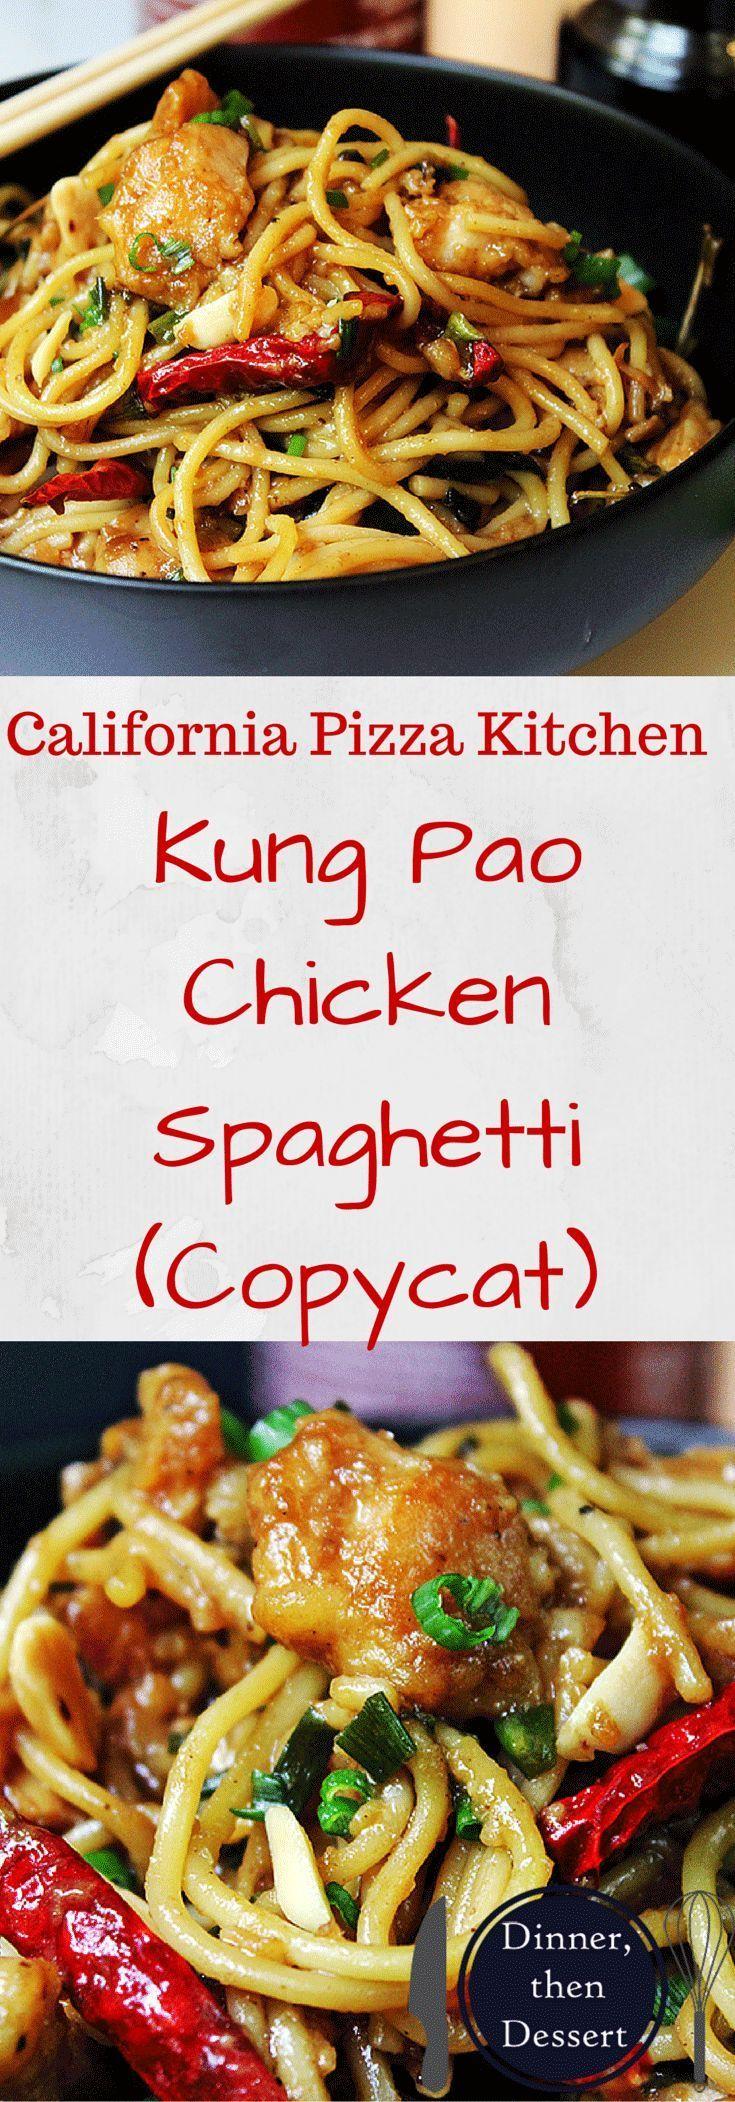 California Pizza Kitchen Best Seller